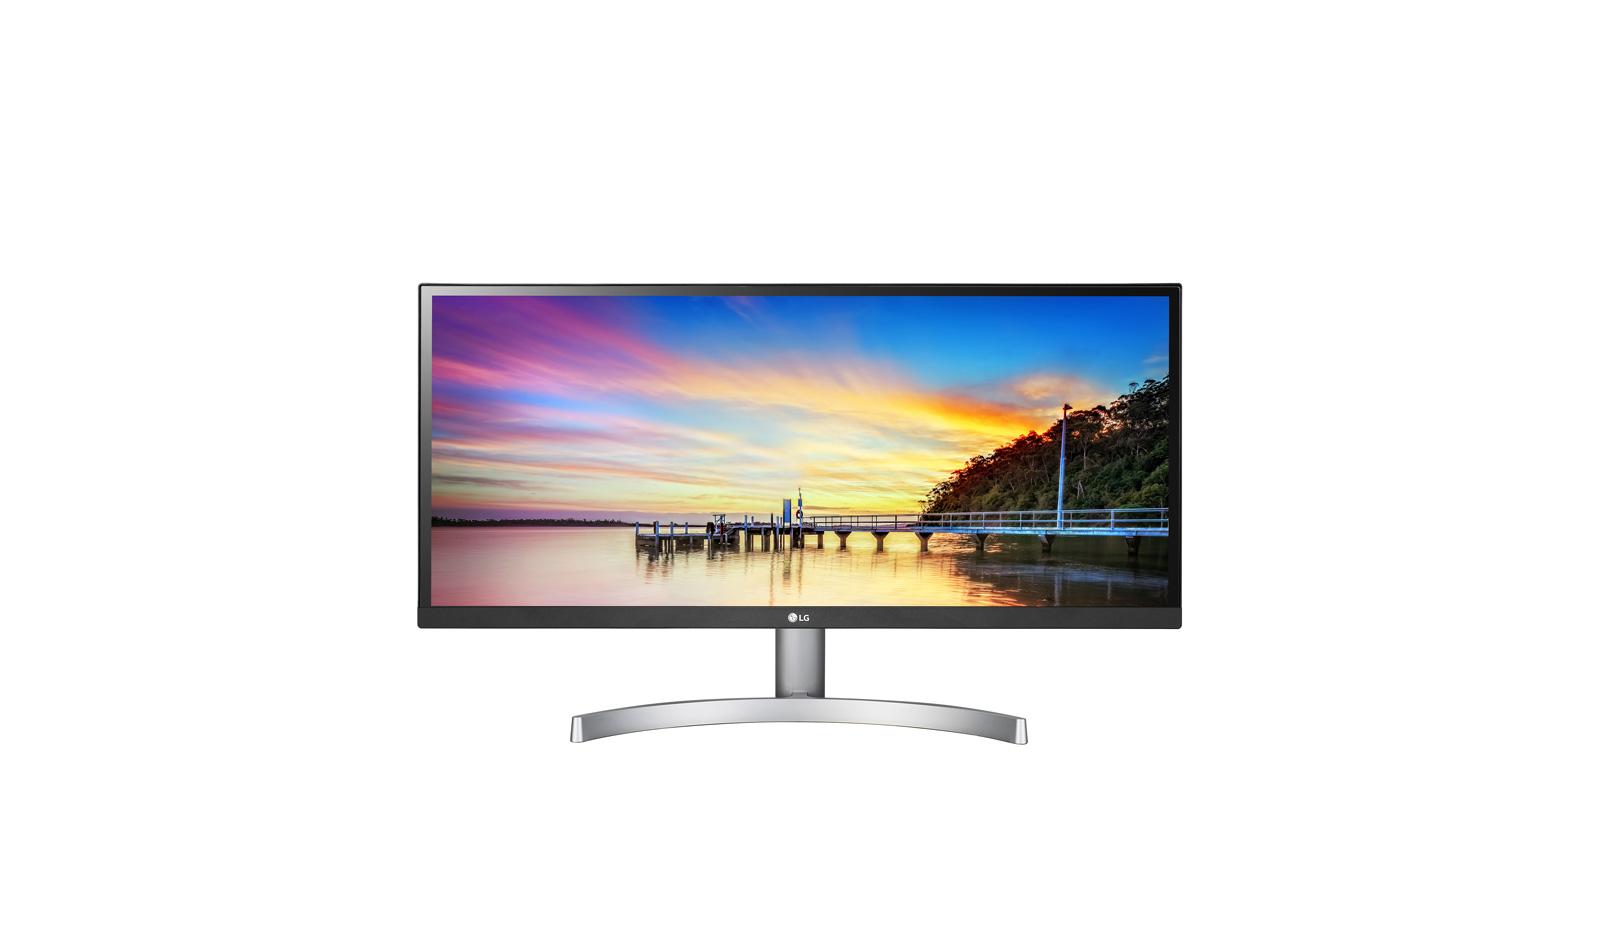 Monitor LED LG 29WK600-W 29 5ms Negru